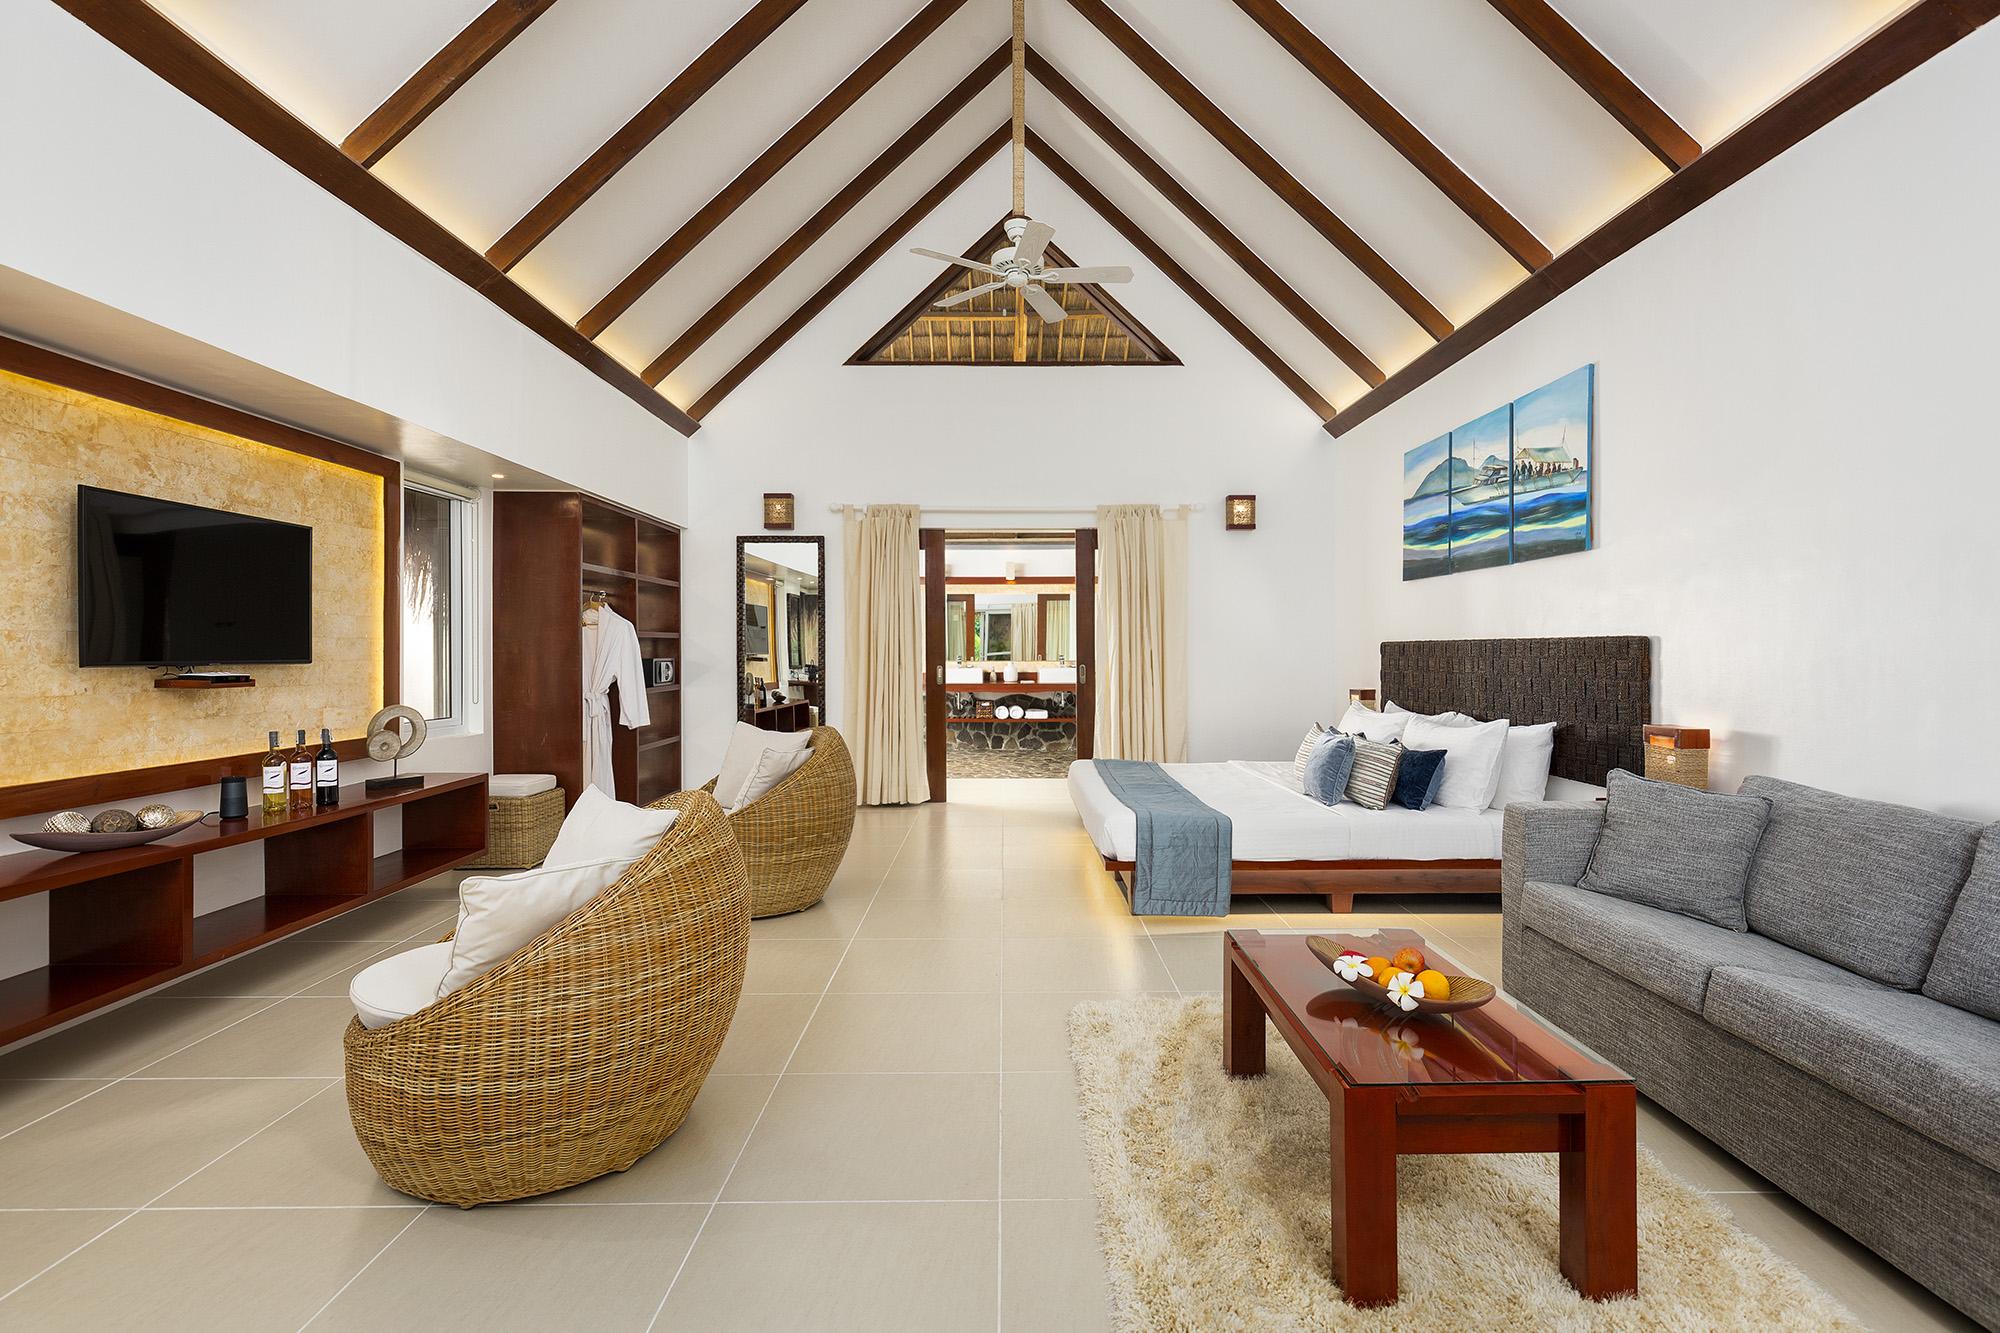 Interior of the Premium Pool Suite at Atmosphere Resorts & Spa Philippines